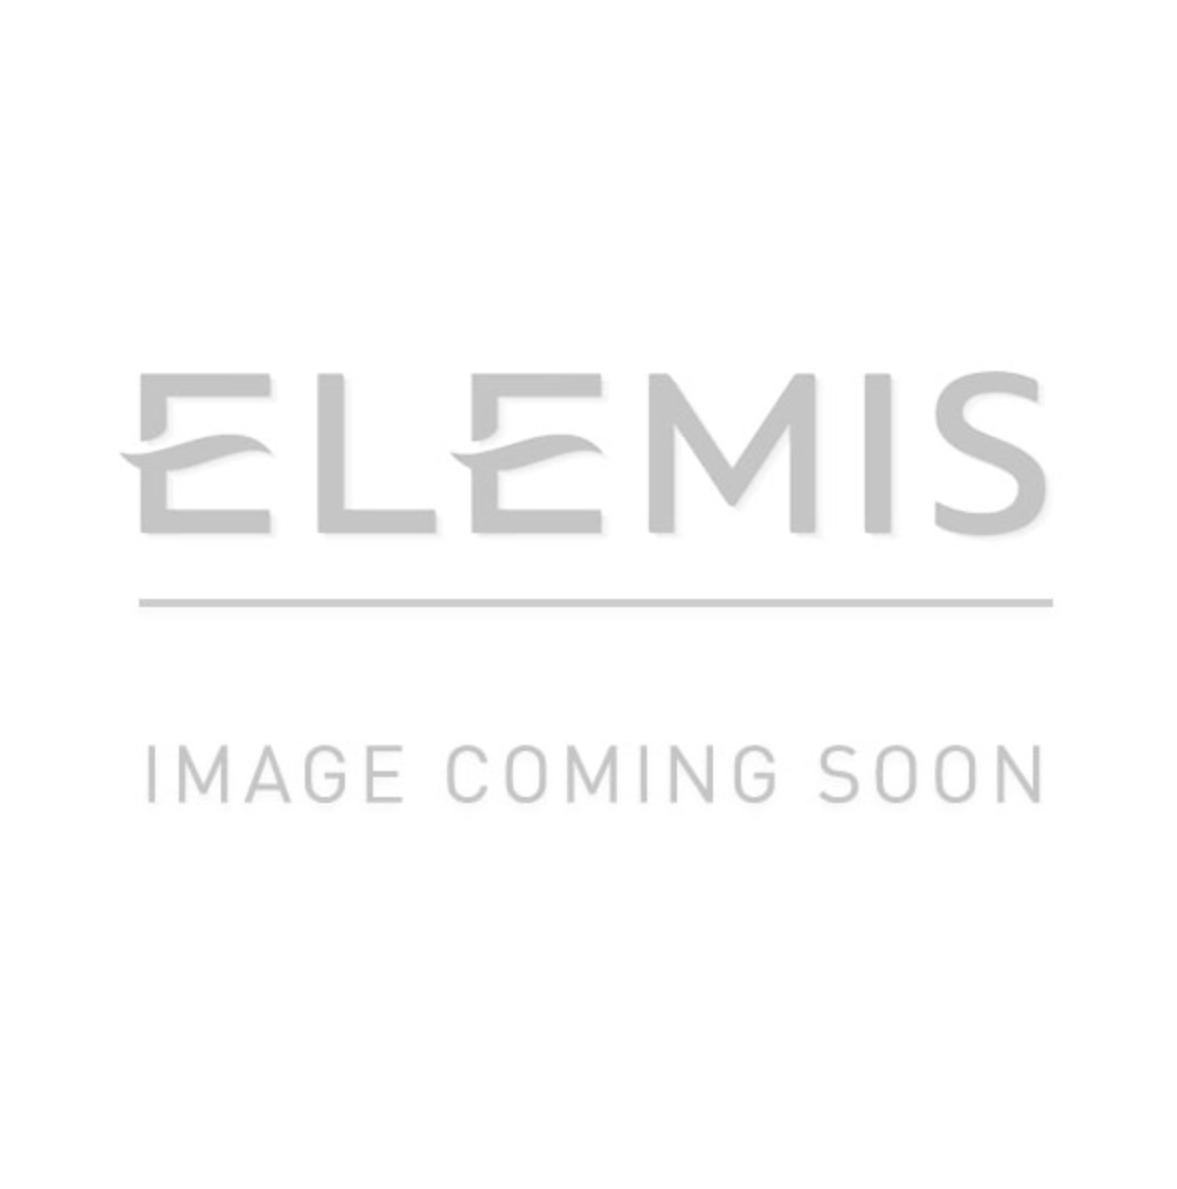 elemis night cream reviews